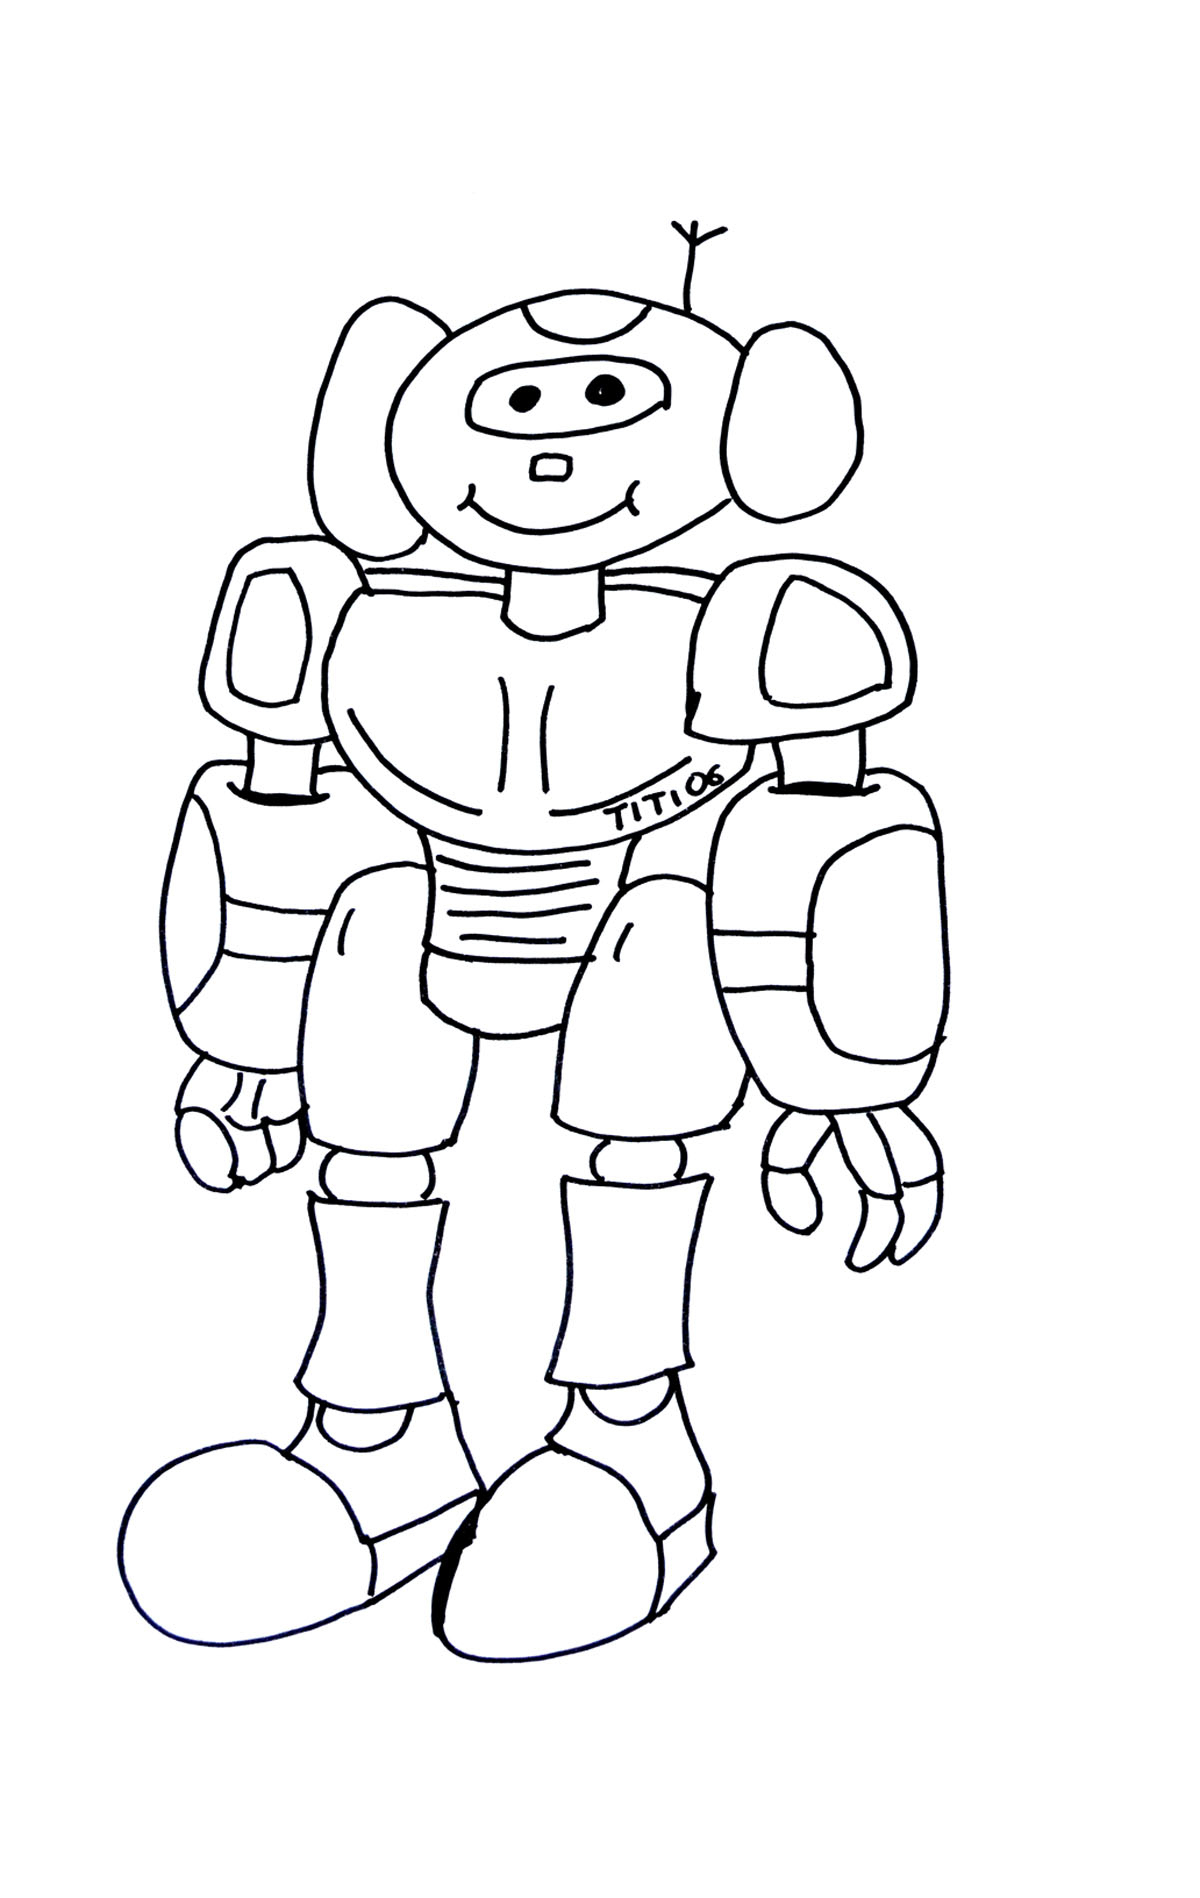 Dessin Robot Transformers concernant Coloriage Siborge ? Imprimer